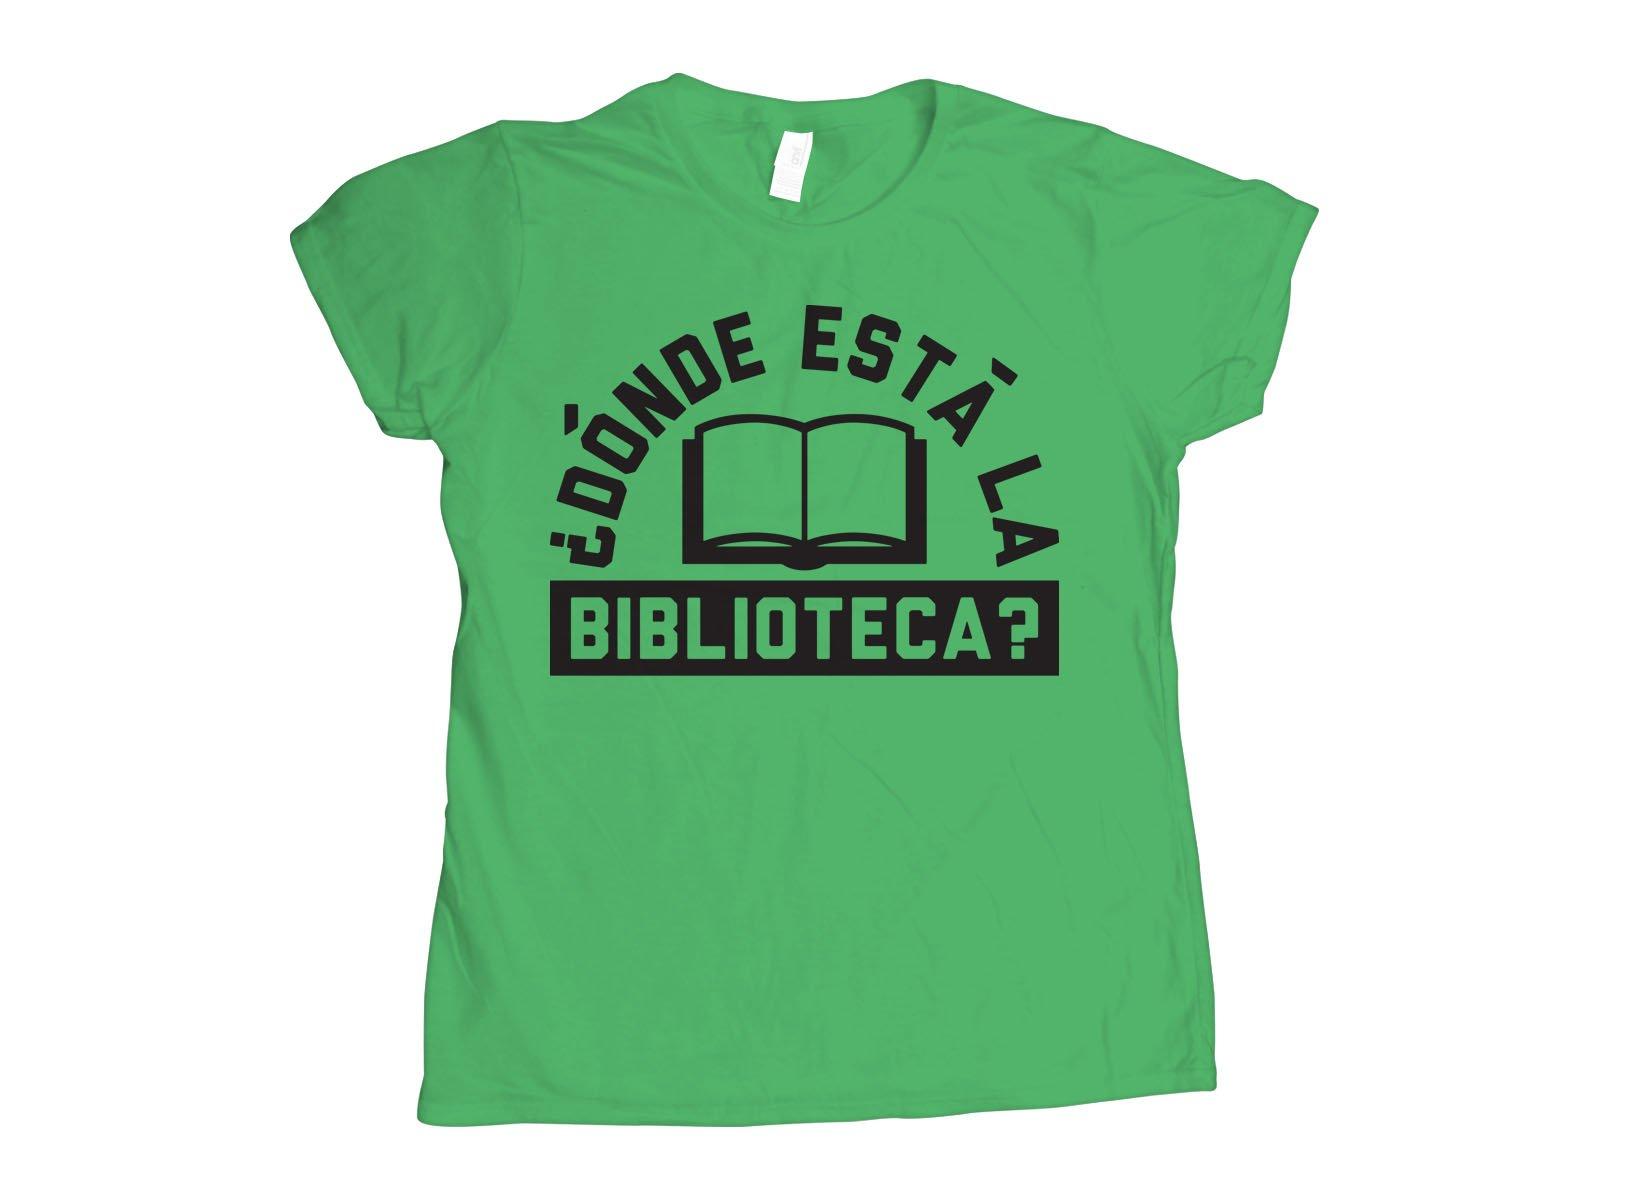 Donde Esta La Biblioteca? on Womens T-Shirt